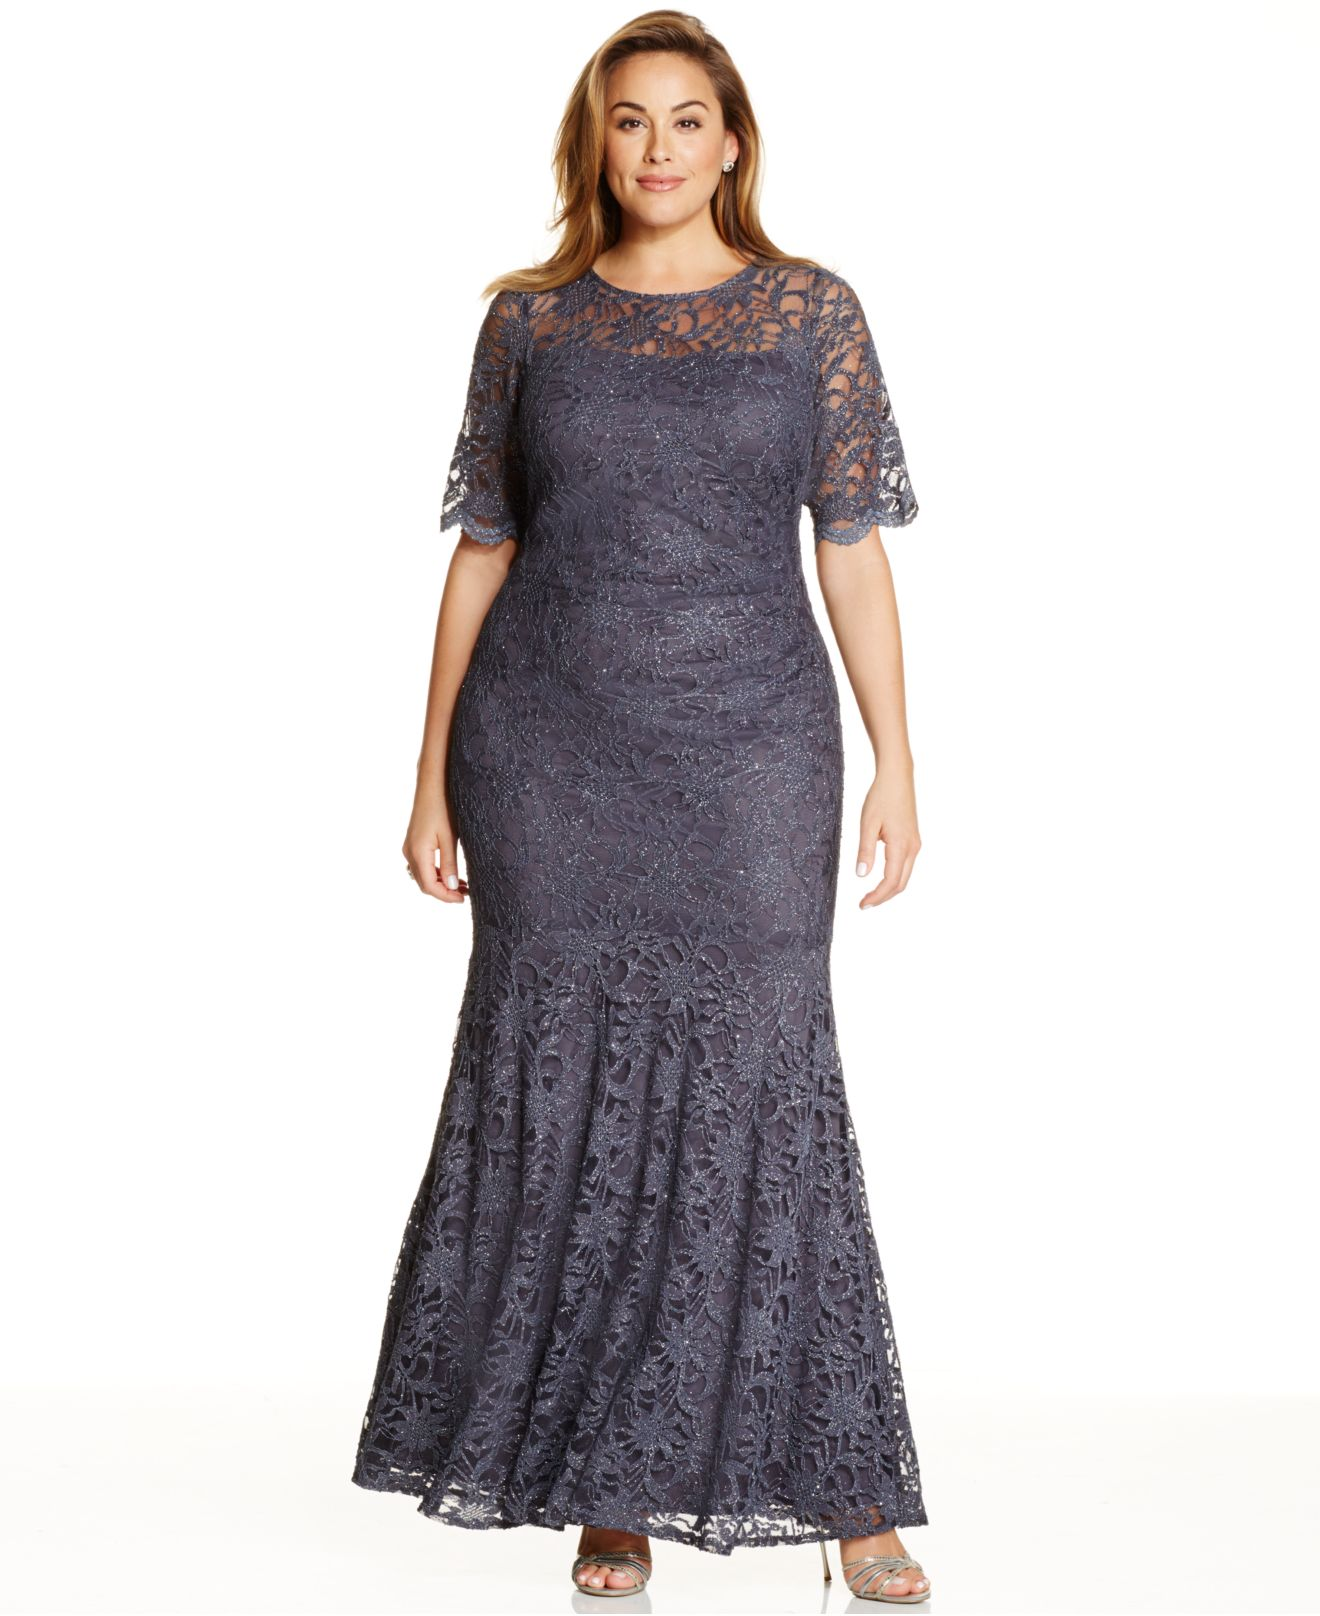 Wedding Plus Size Formal formal plus size dresses kapres molene dresses